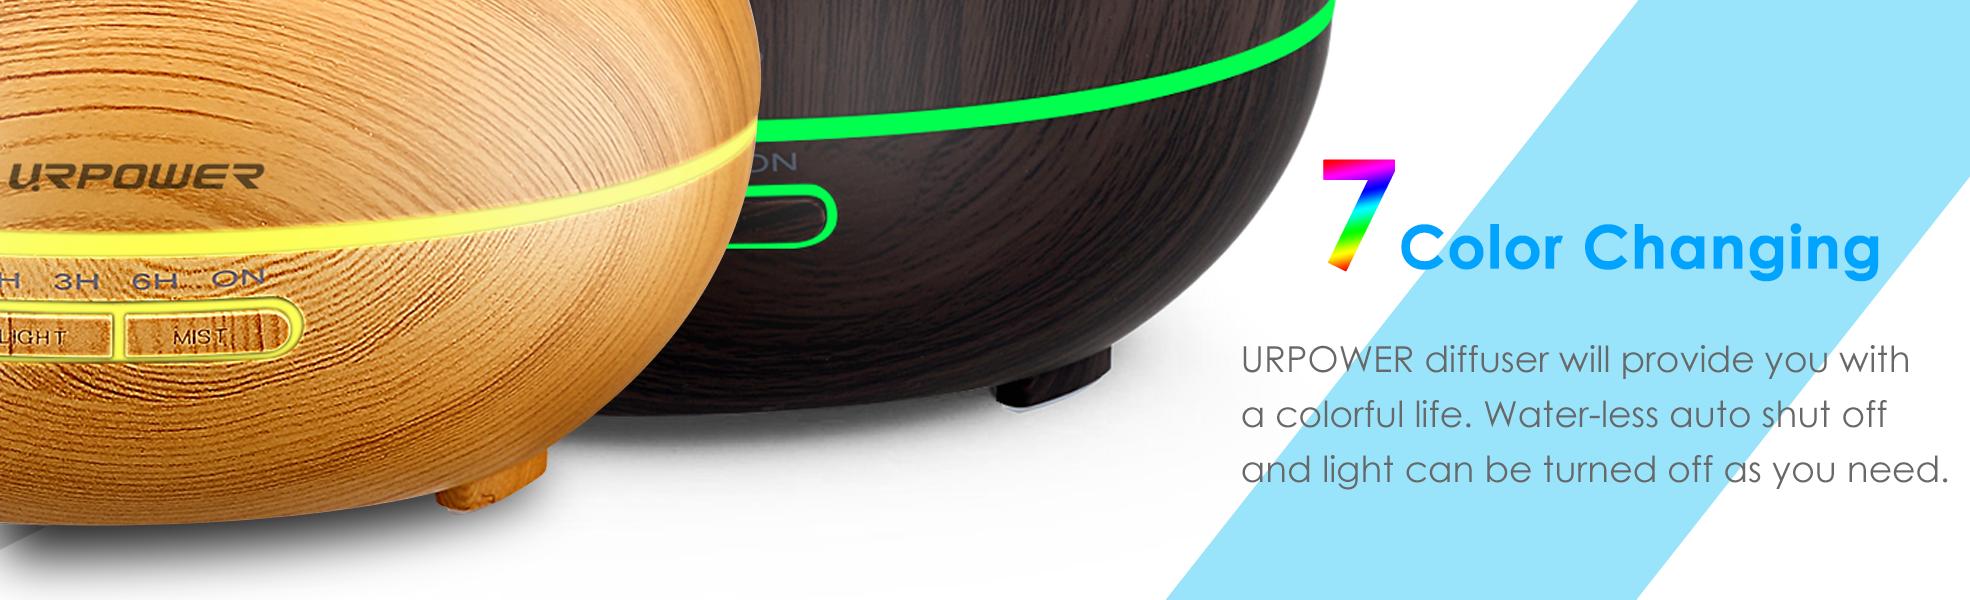 urpower essential oil diffuser 200ml wood grain aromatherapy diffuser ultrasonic. Black Bedroom Furniture Sets. Home Design Ideas